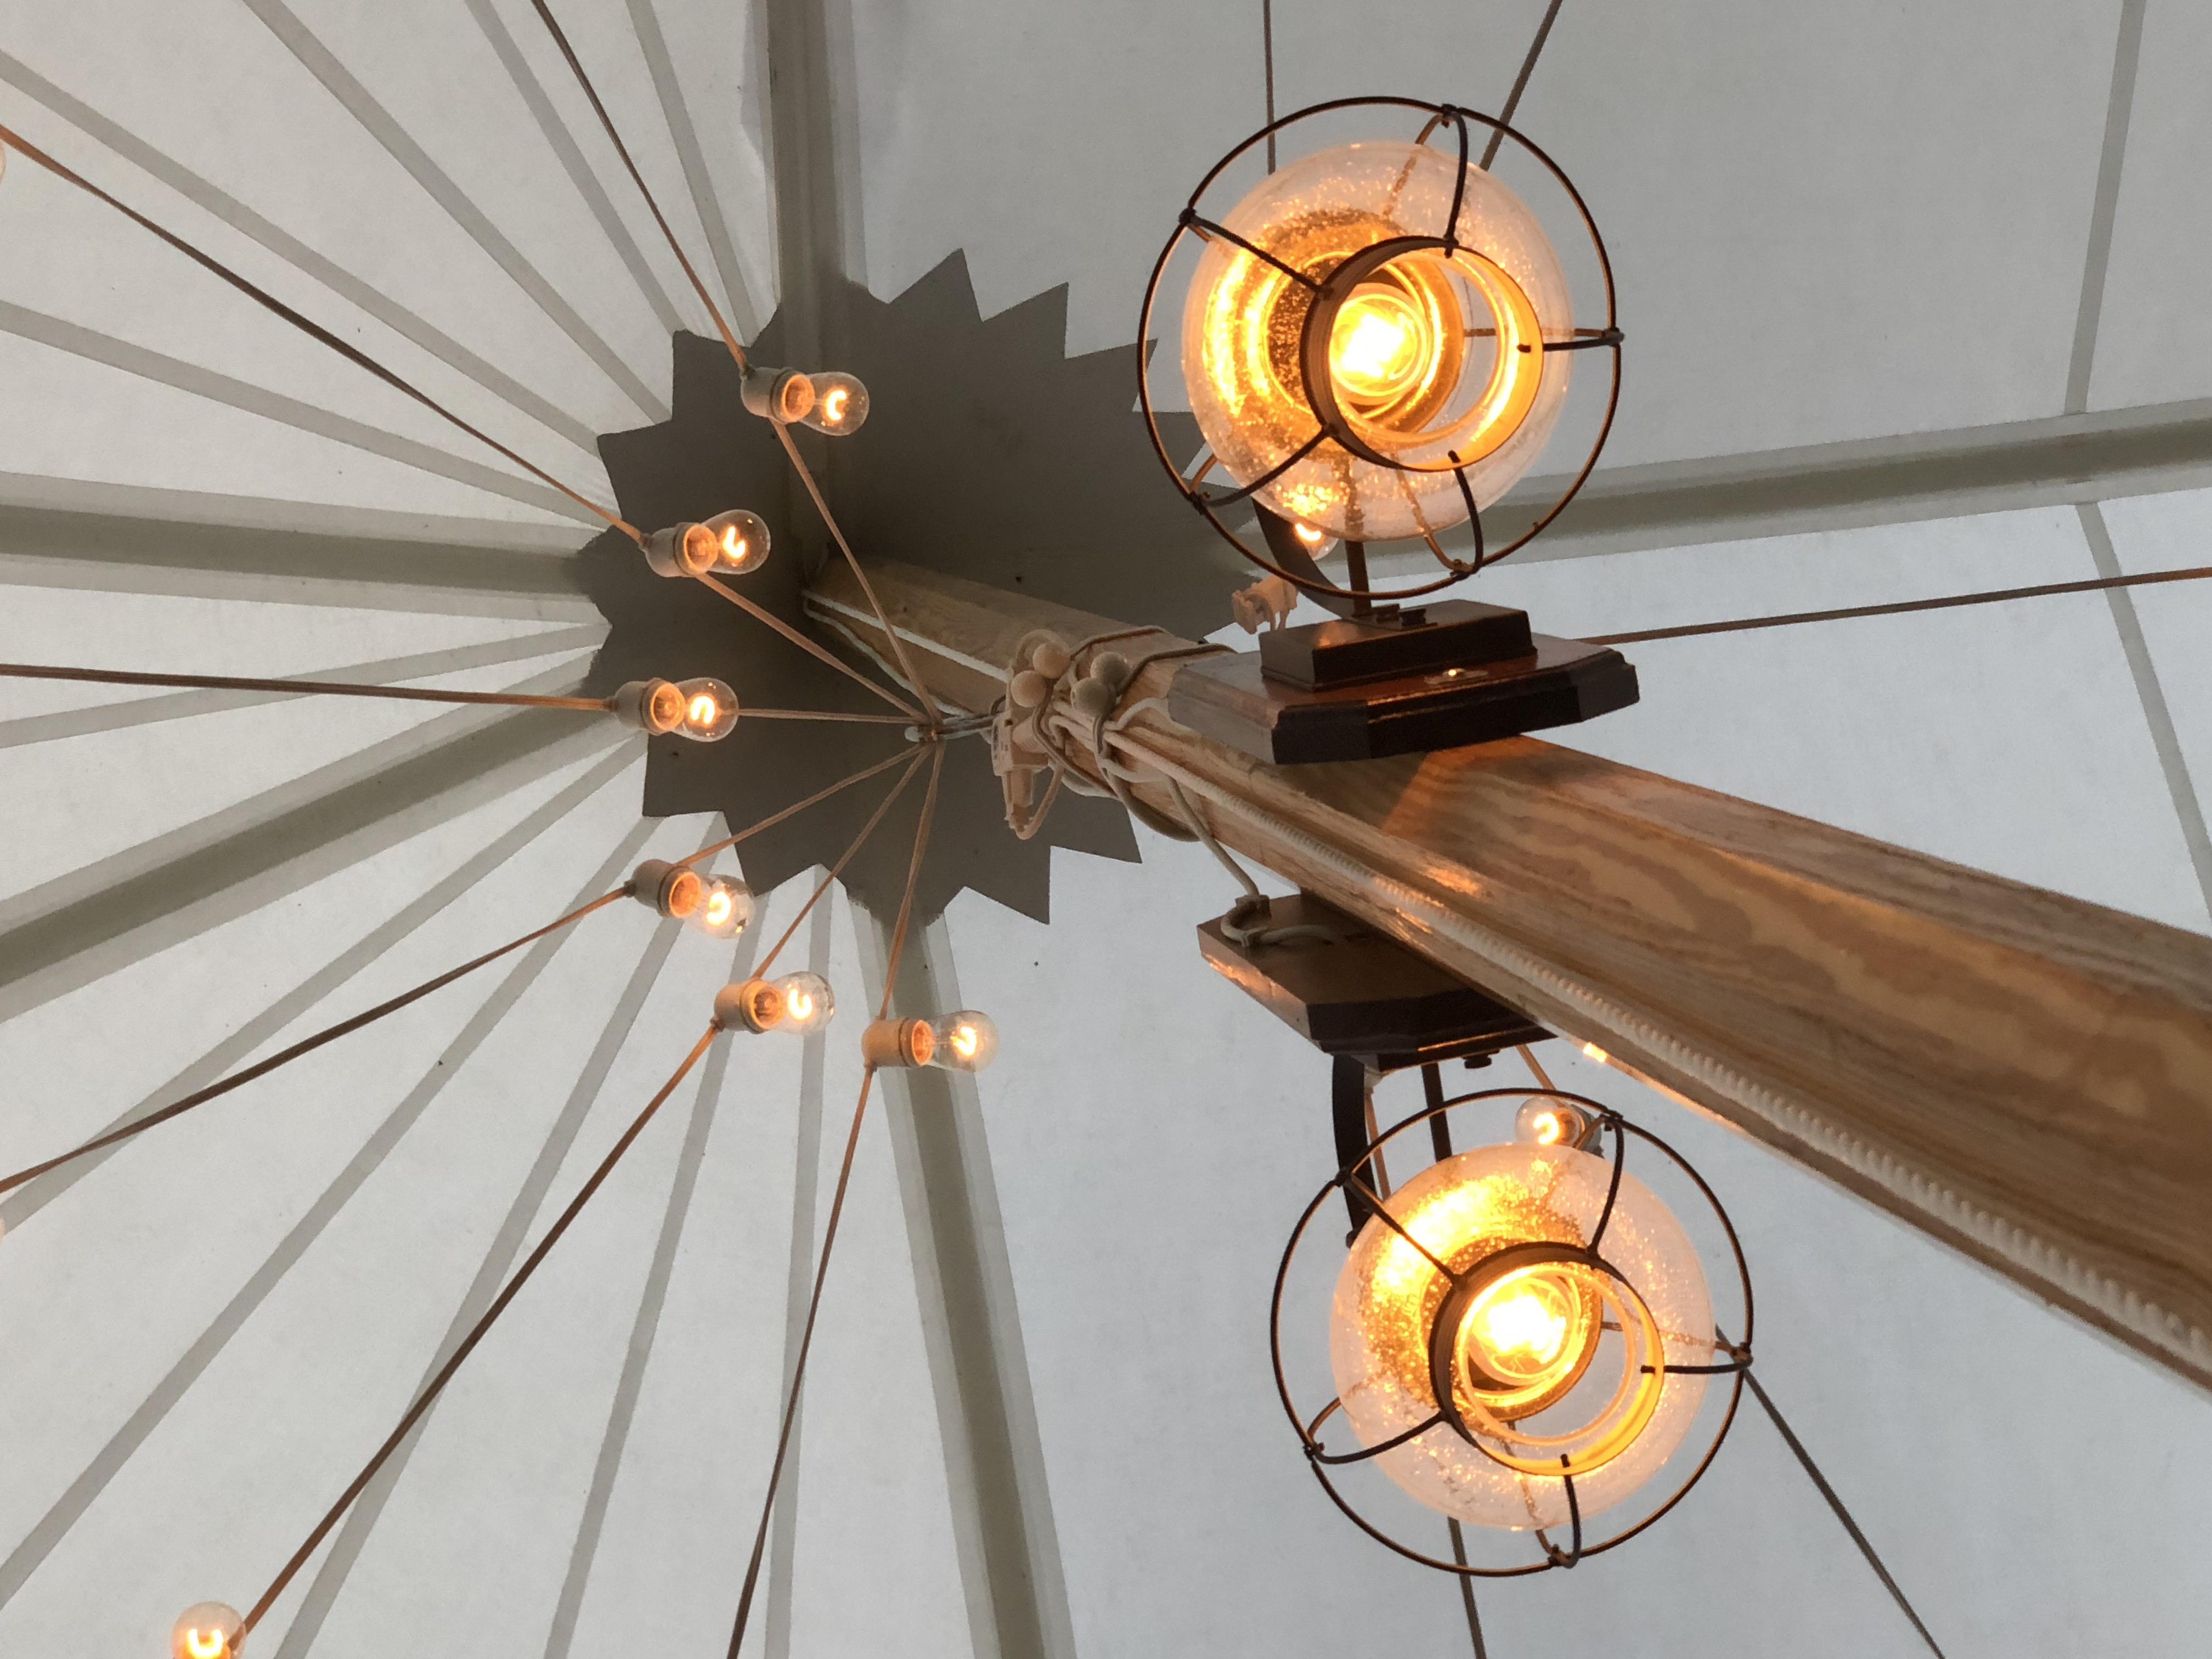 Onion Lamps